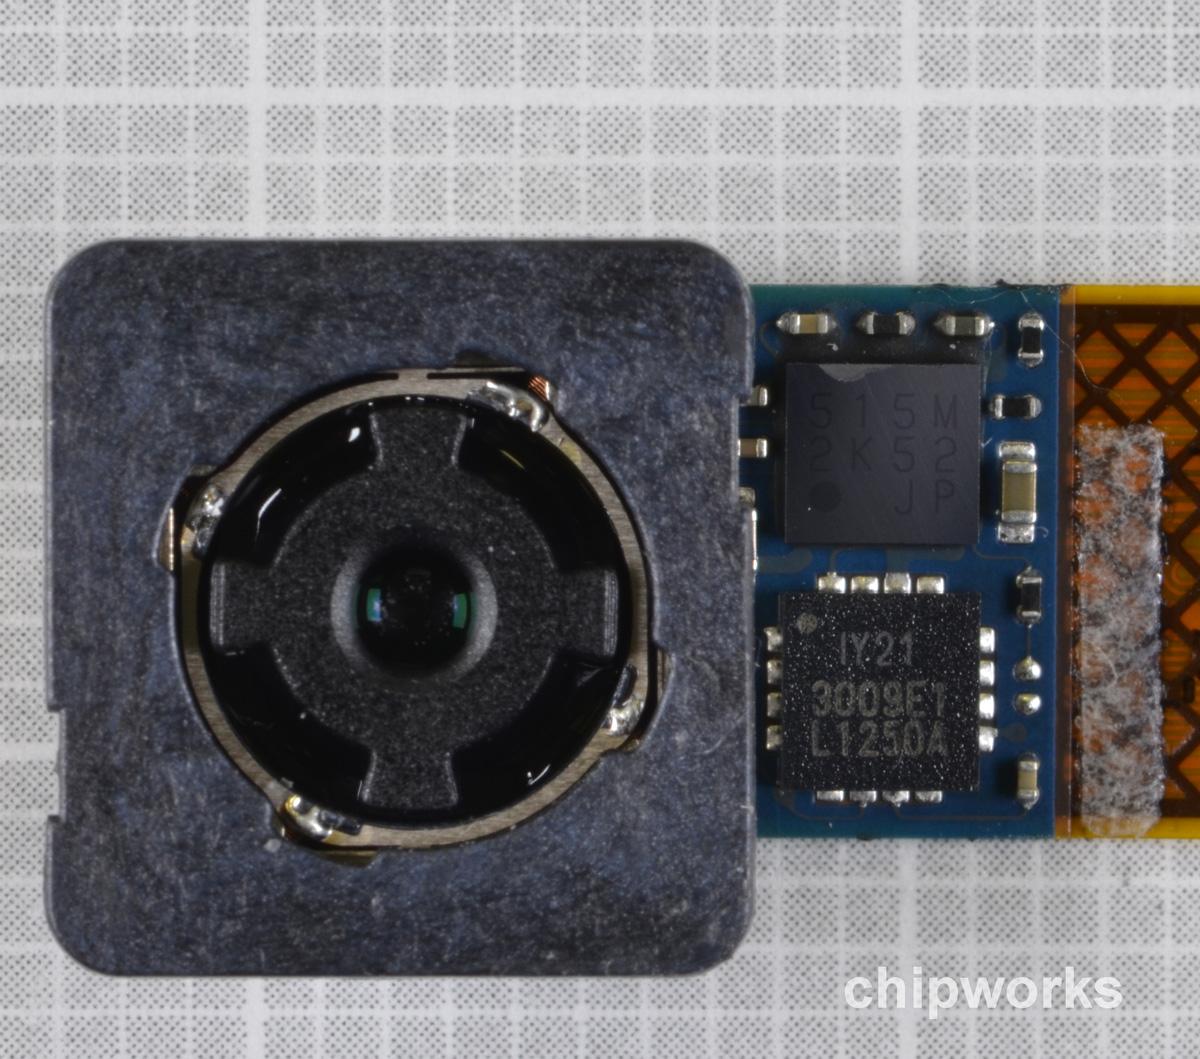 Amazon.com: Customer reviews: Sony Cyber-shot DSC-RX1 RII ...